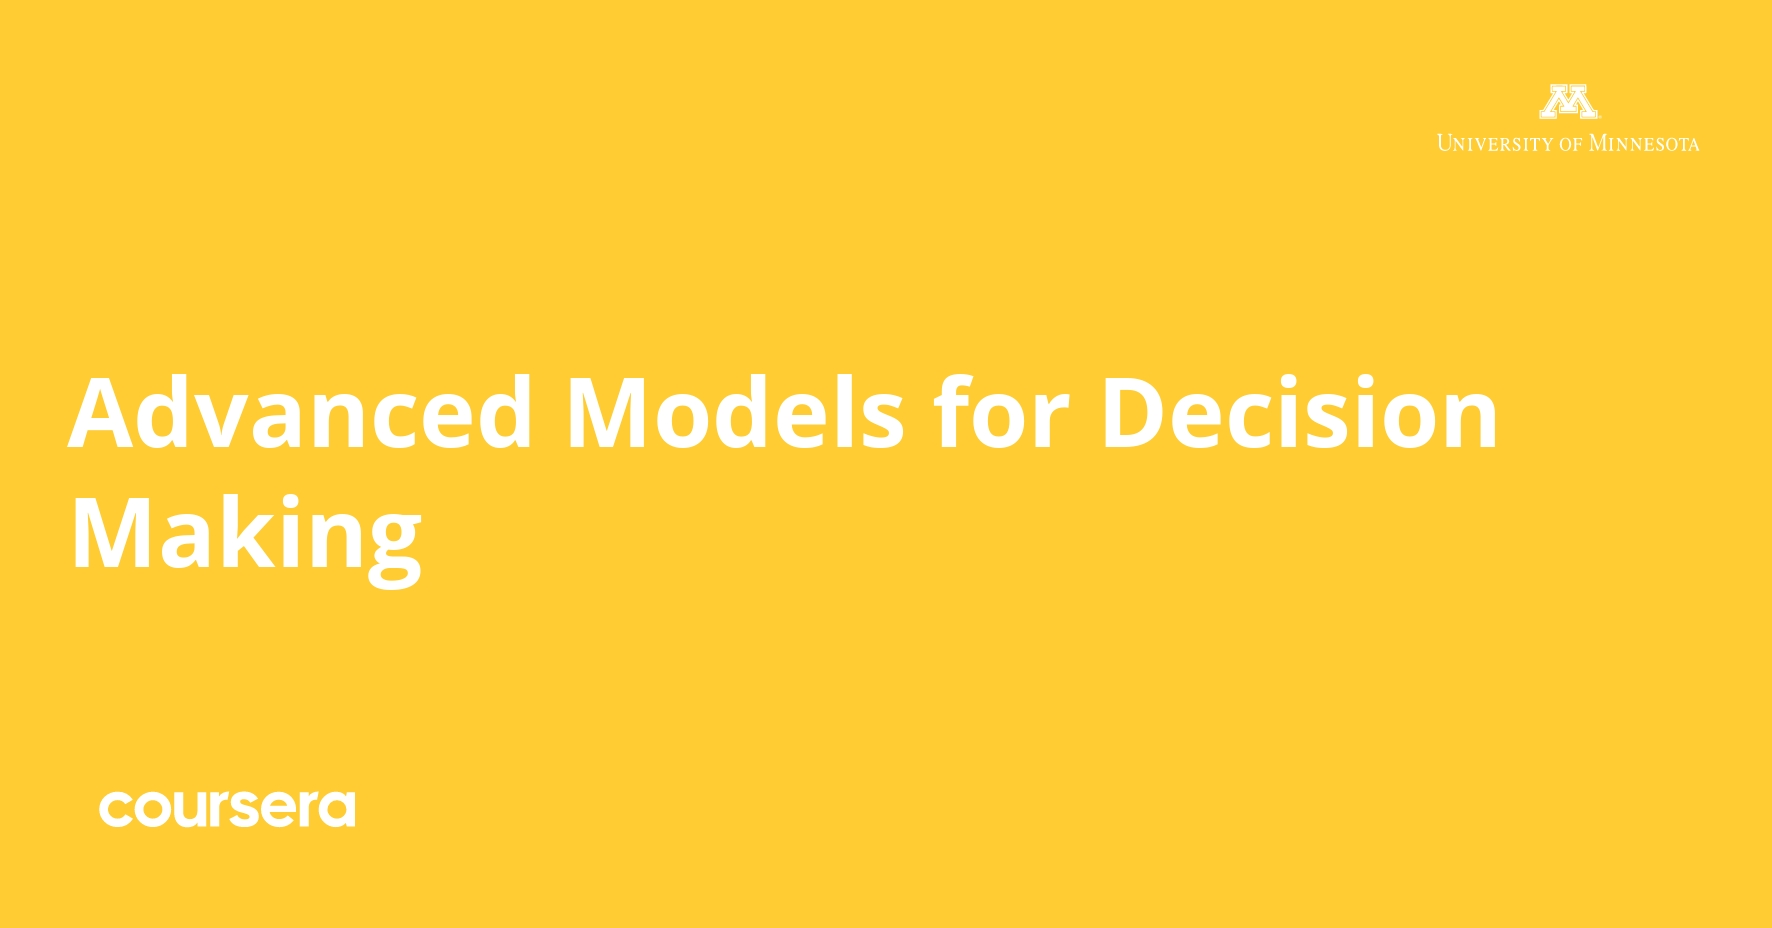 Advanced Models for Decision Making